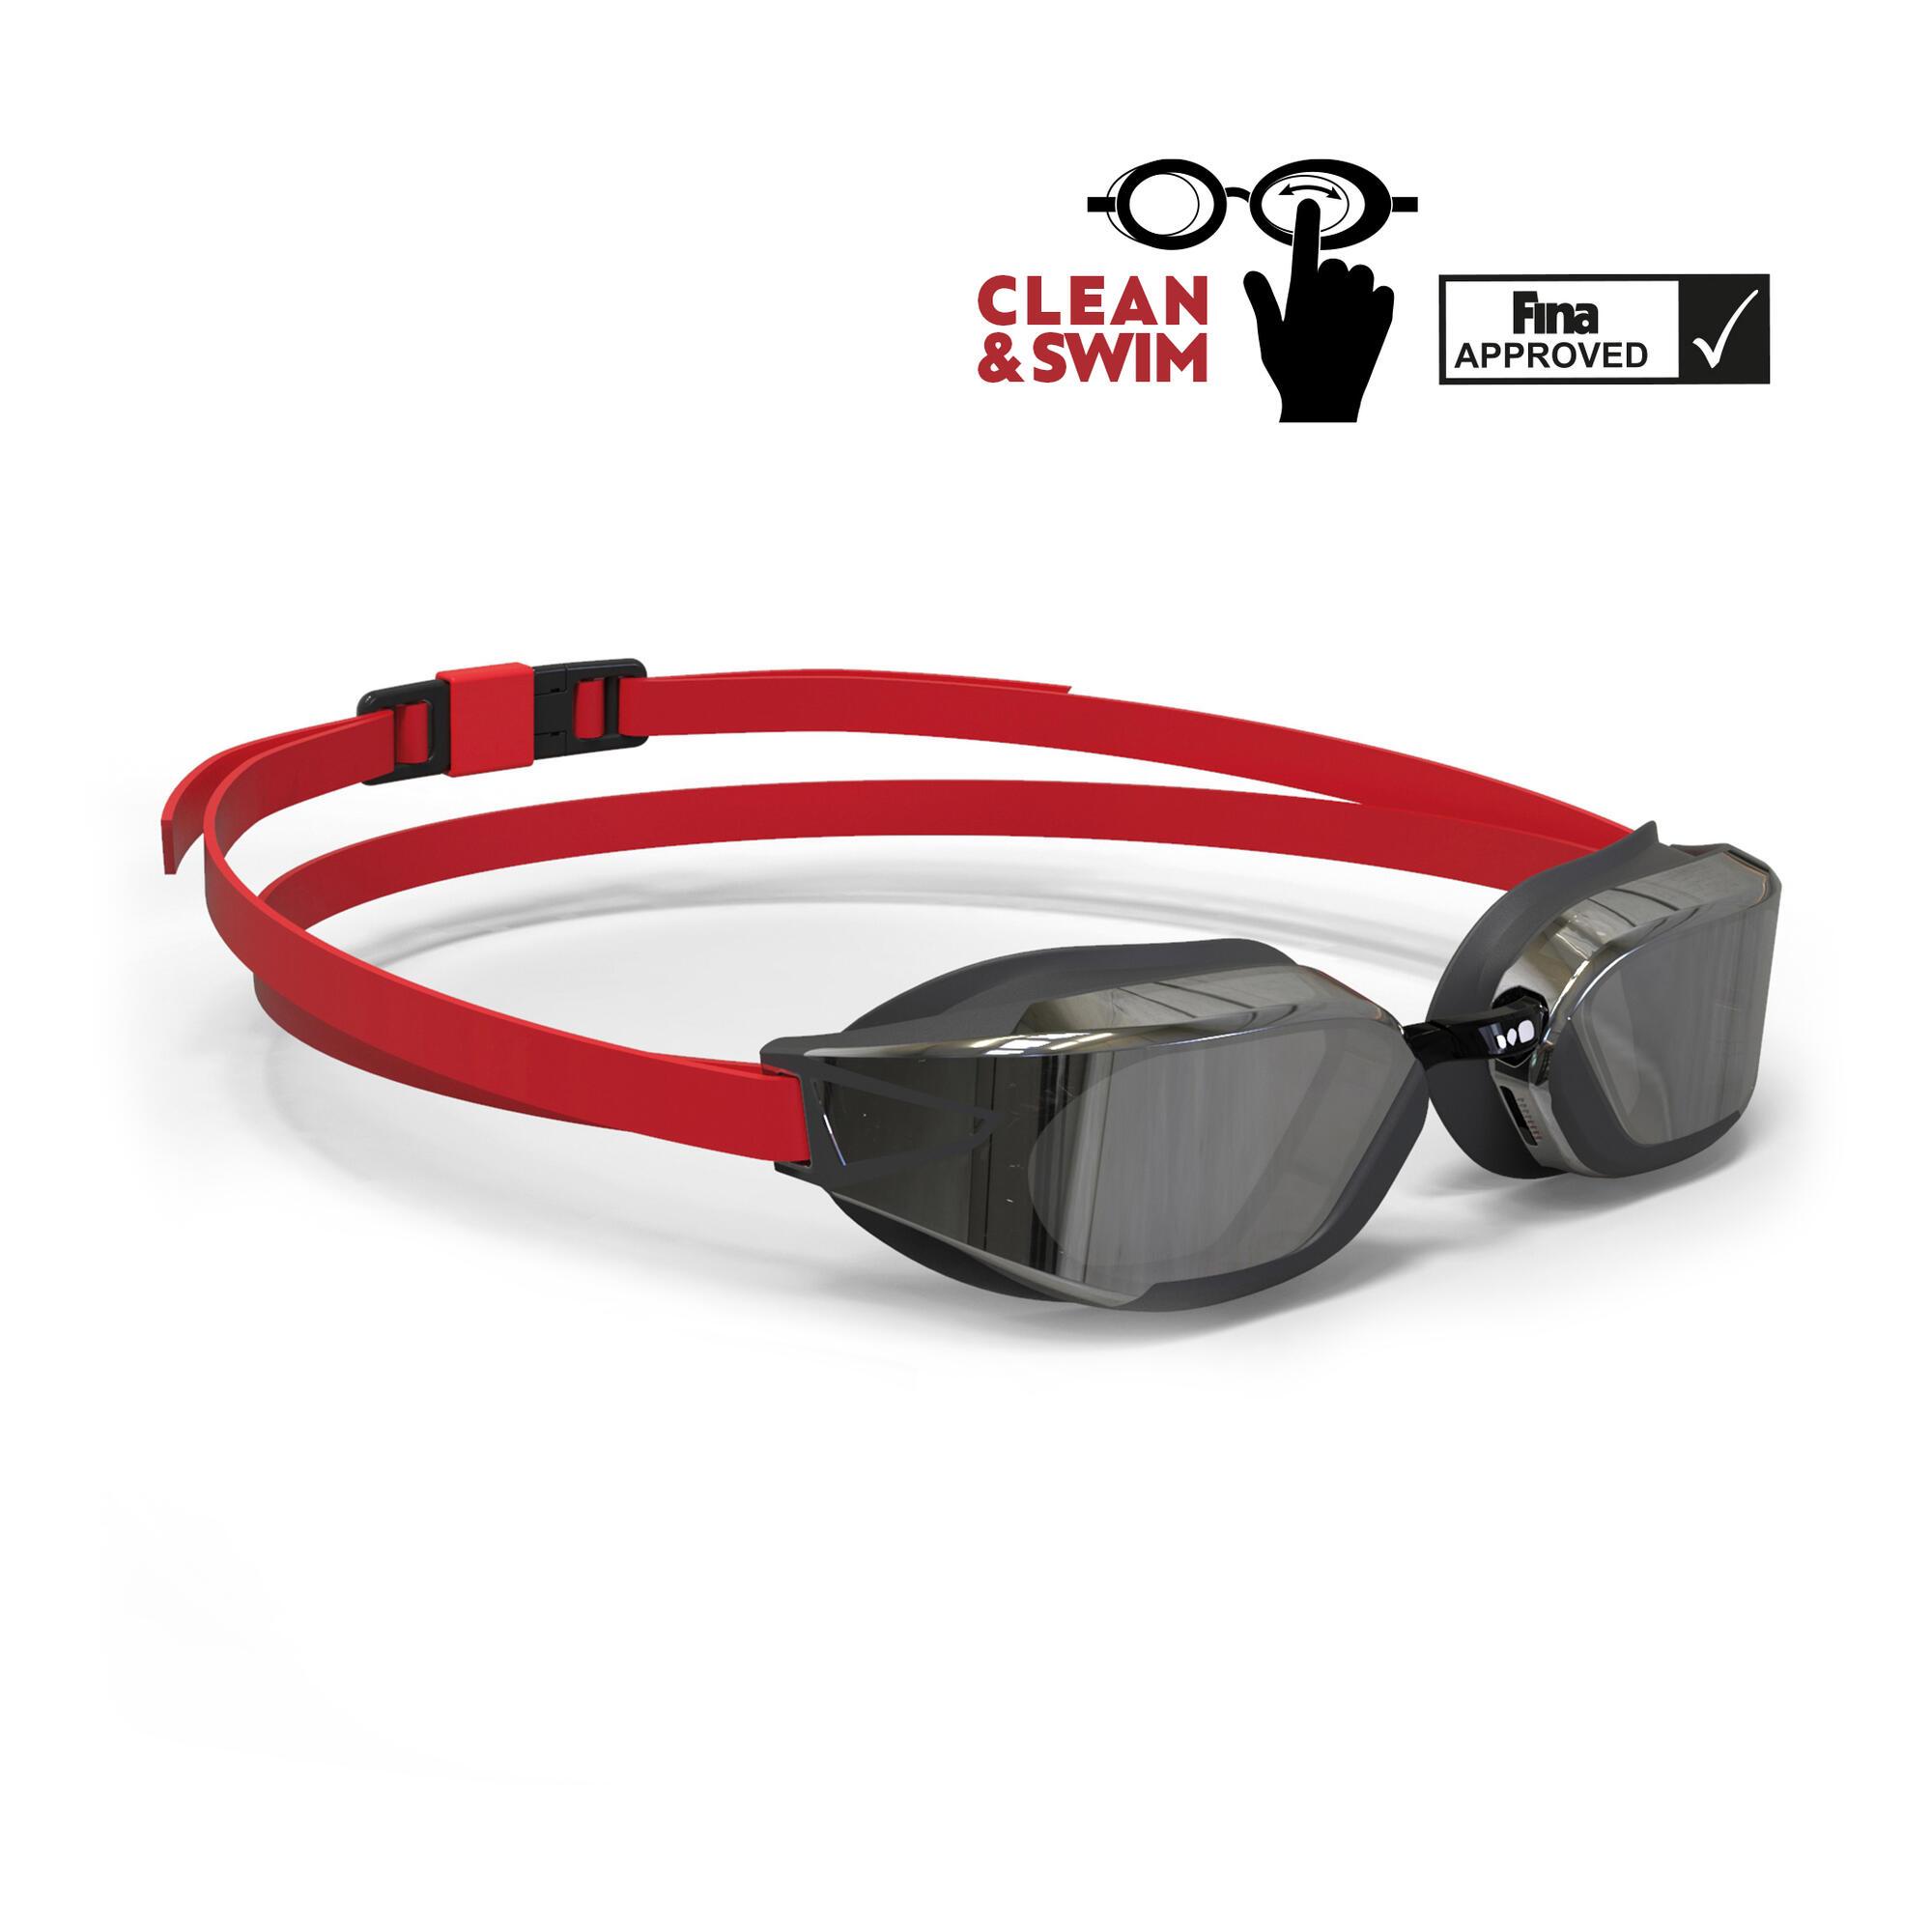 lunettes de natation micro r glables 900 b fast clean swim nabaiji